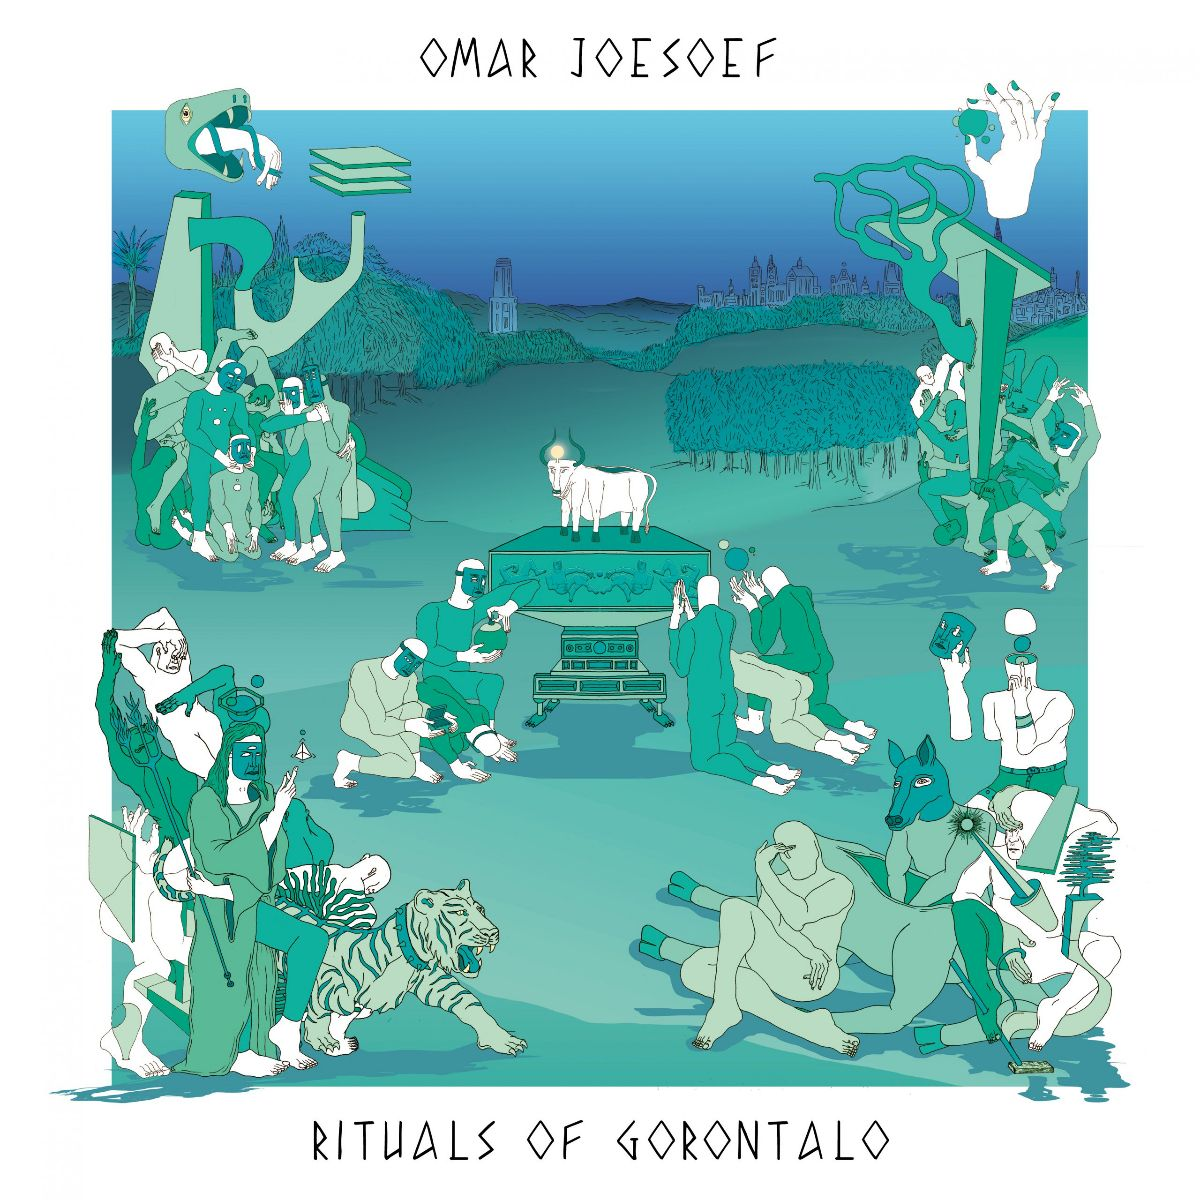 Omar Joesoef - Rituals Of Gorontalo w/ Cosmo Vitelli & Jonathan Kusuma Remixes